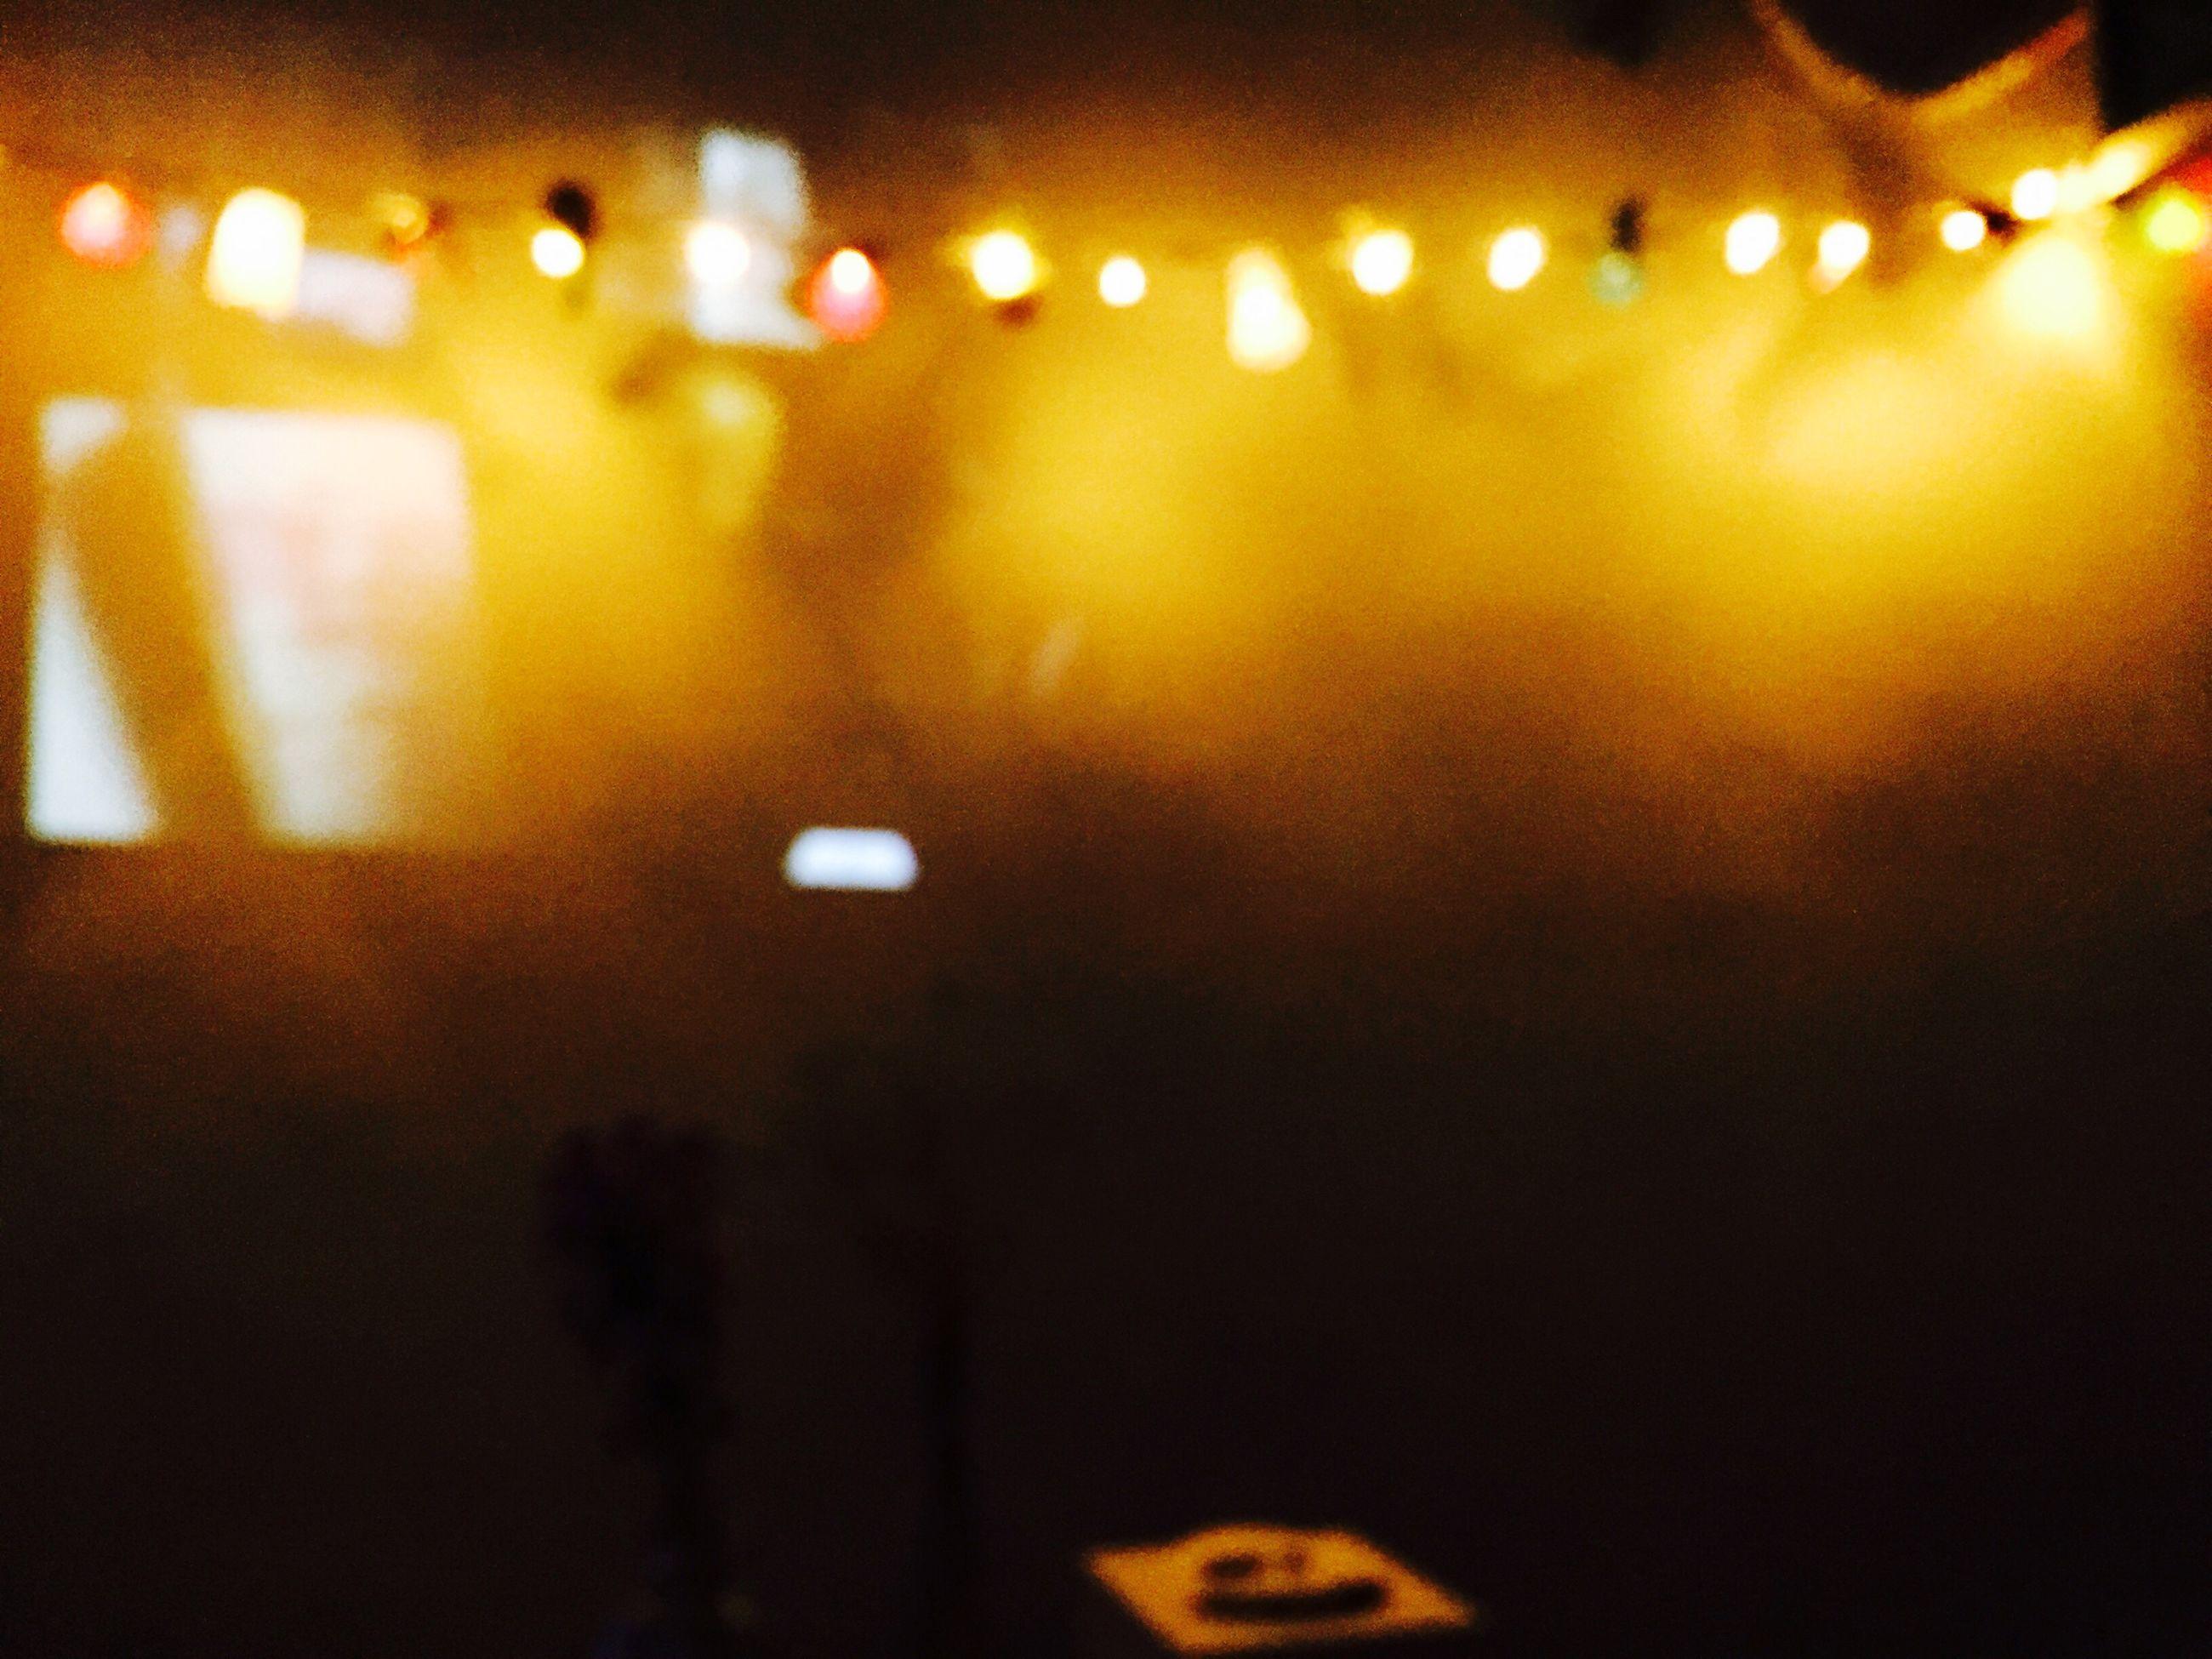 illuminated, night, defocused, lighting equipment, light - natural phenomenon, indoors, light, glowing, dark, no people, focus on foreground, street light, electric light, street, transportation, city, lens flare, blurred, selective focus, pattern